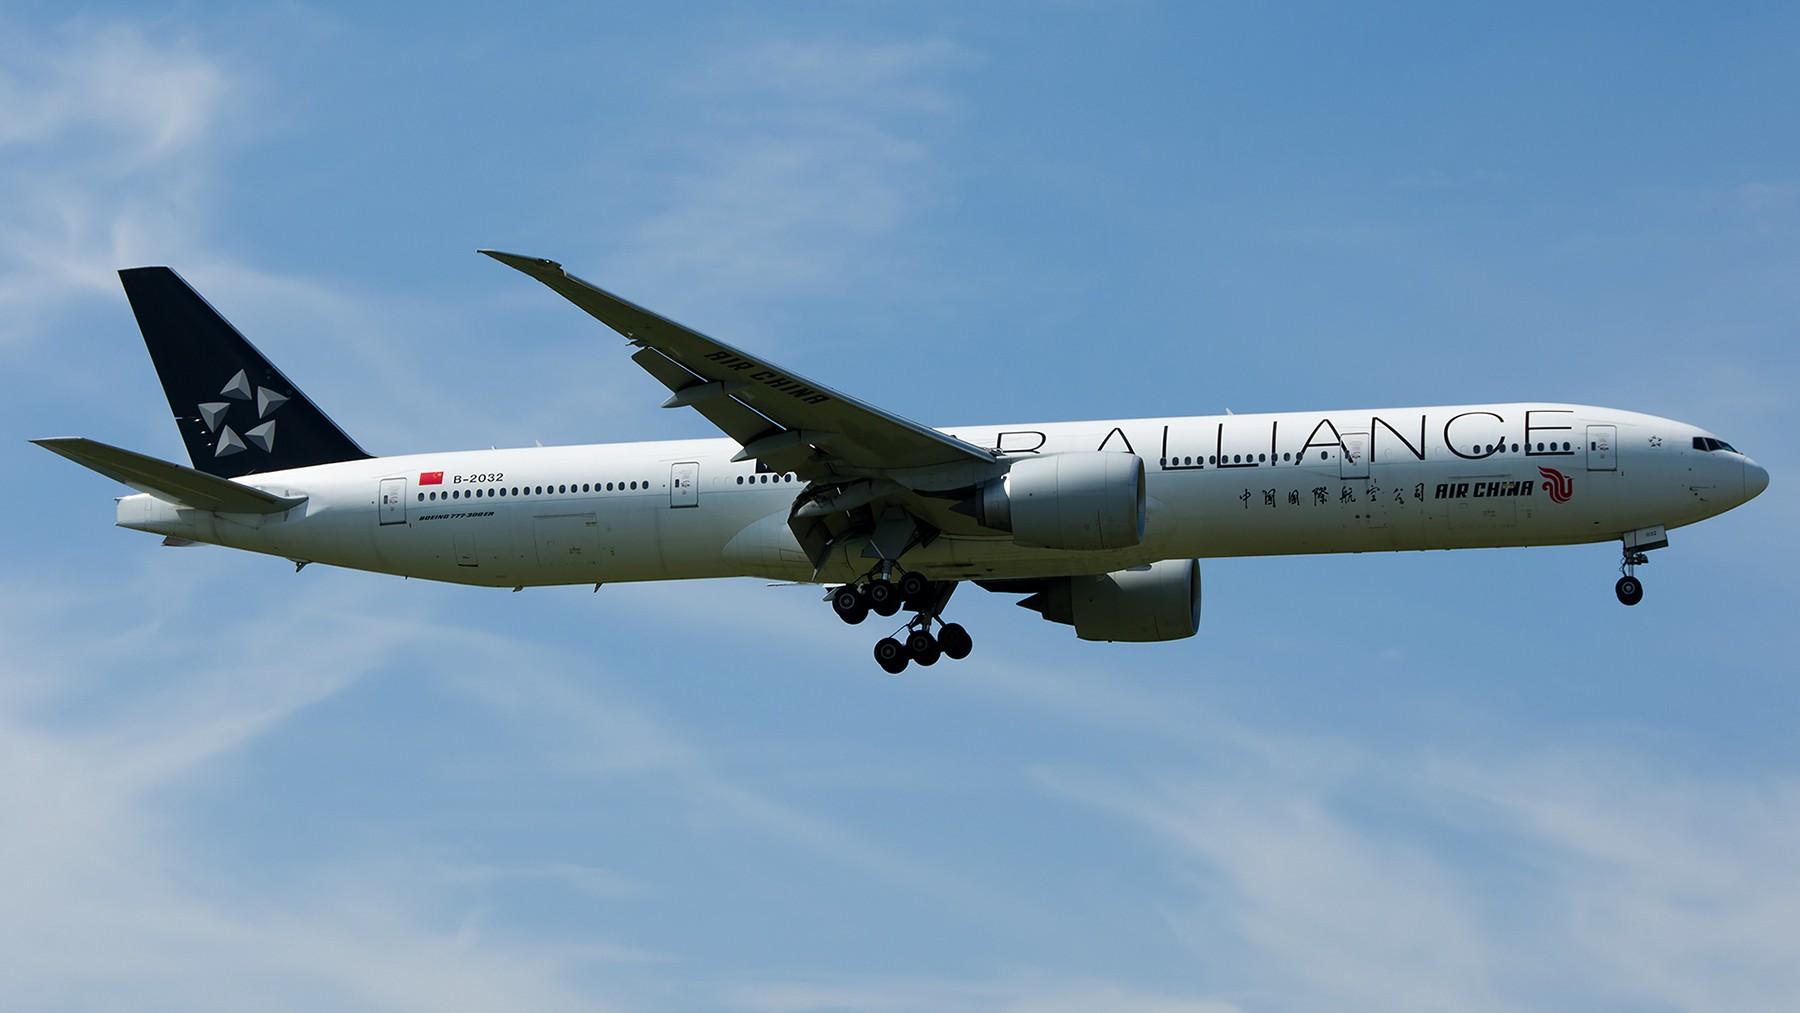 Re:[原创]终于放假了,出来冒个泡,随便发几张 BOEING 777-300ER B-2032 中国北京首都国际机场